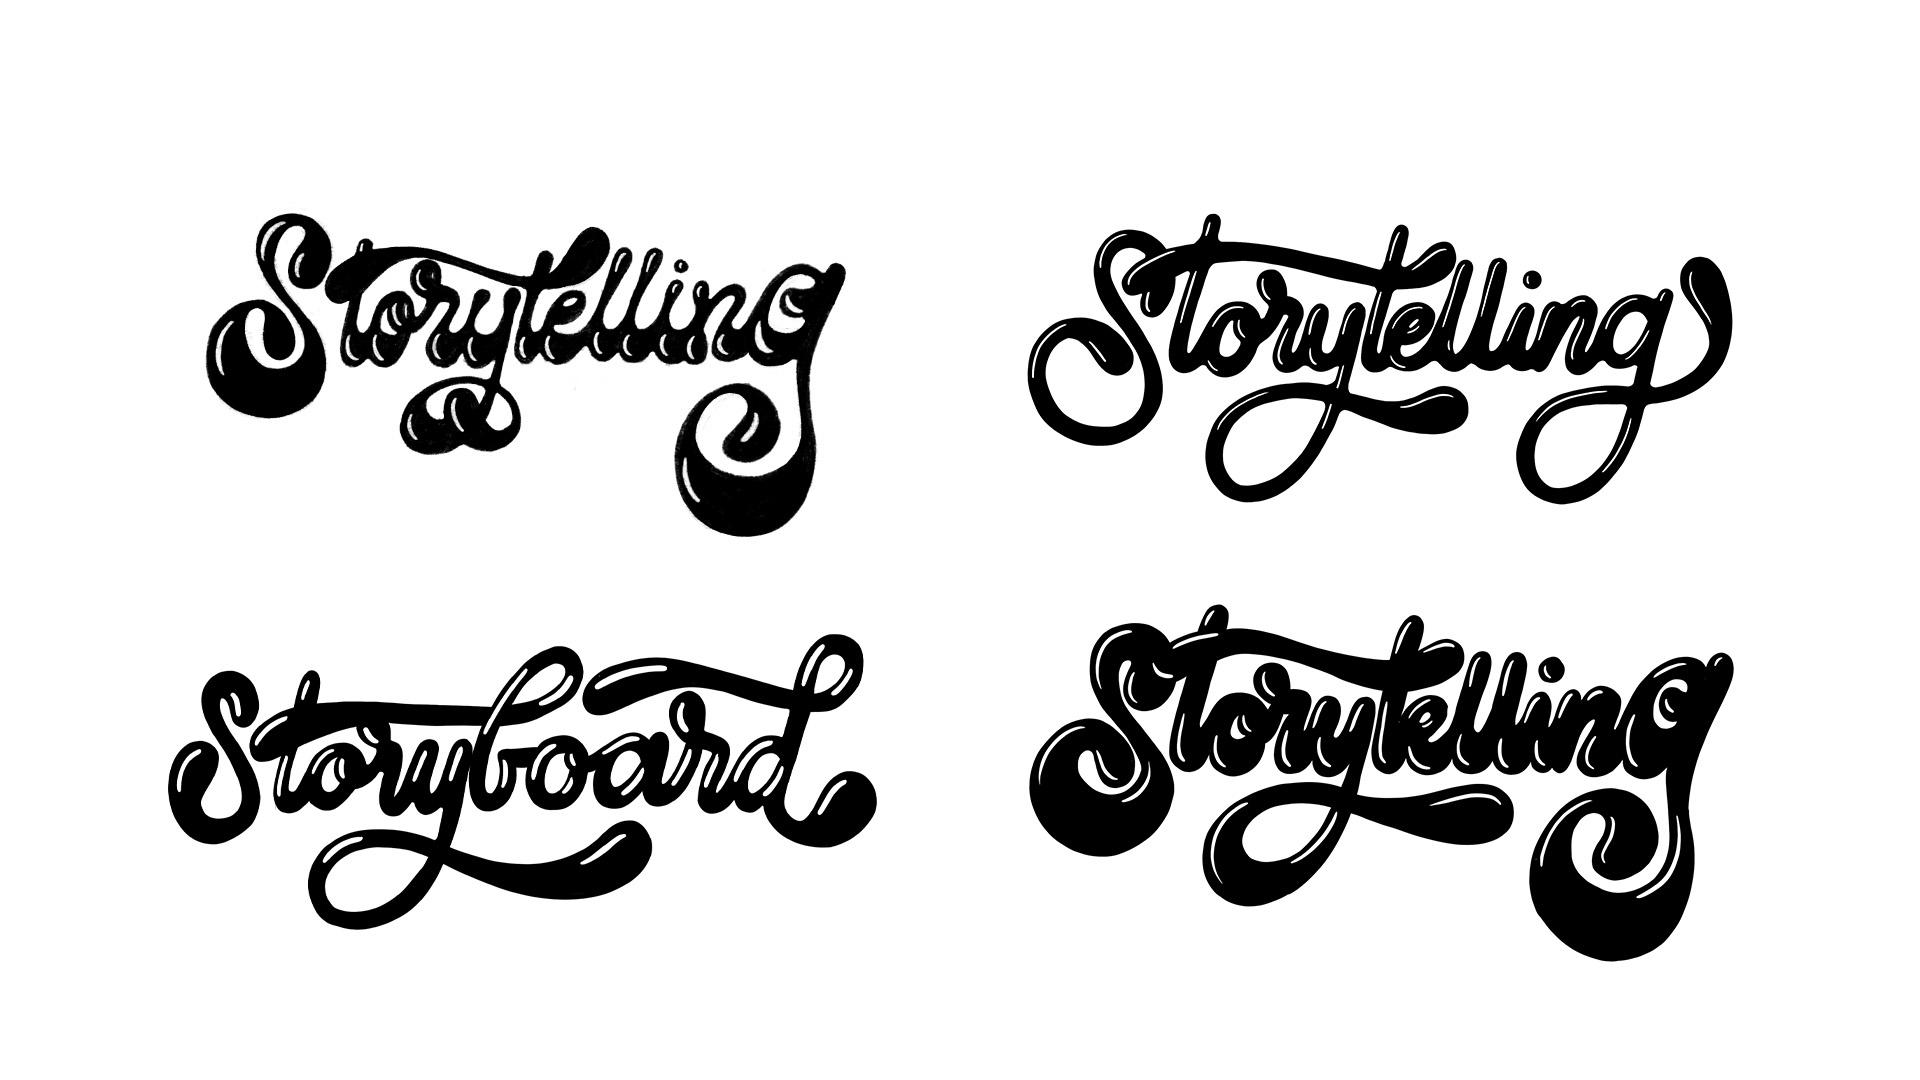 roofstudio_juni-learning_storytelling-02-3